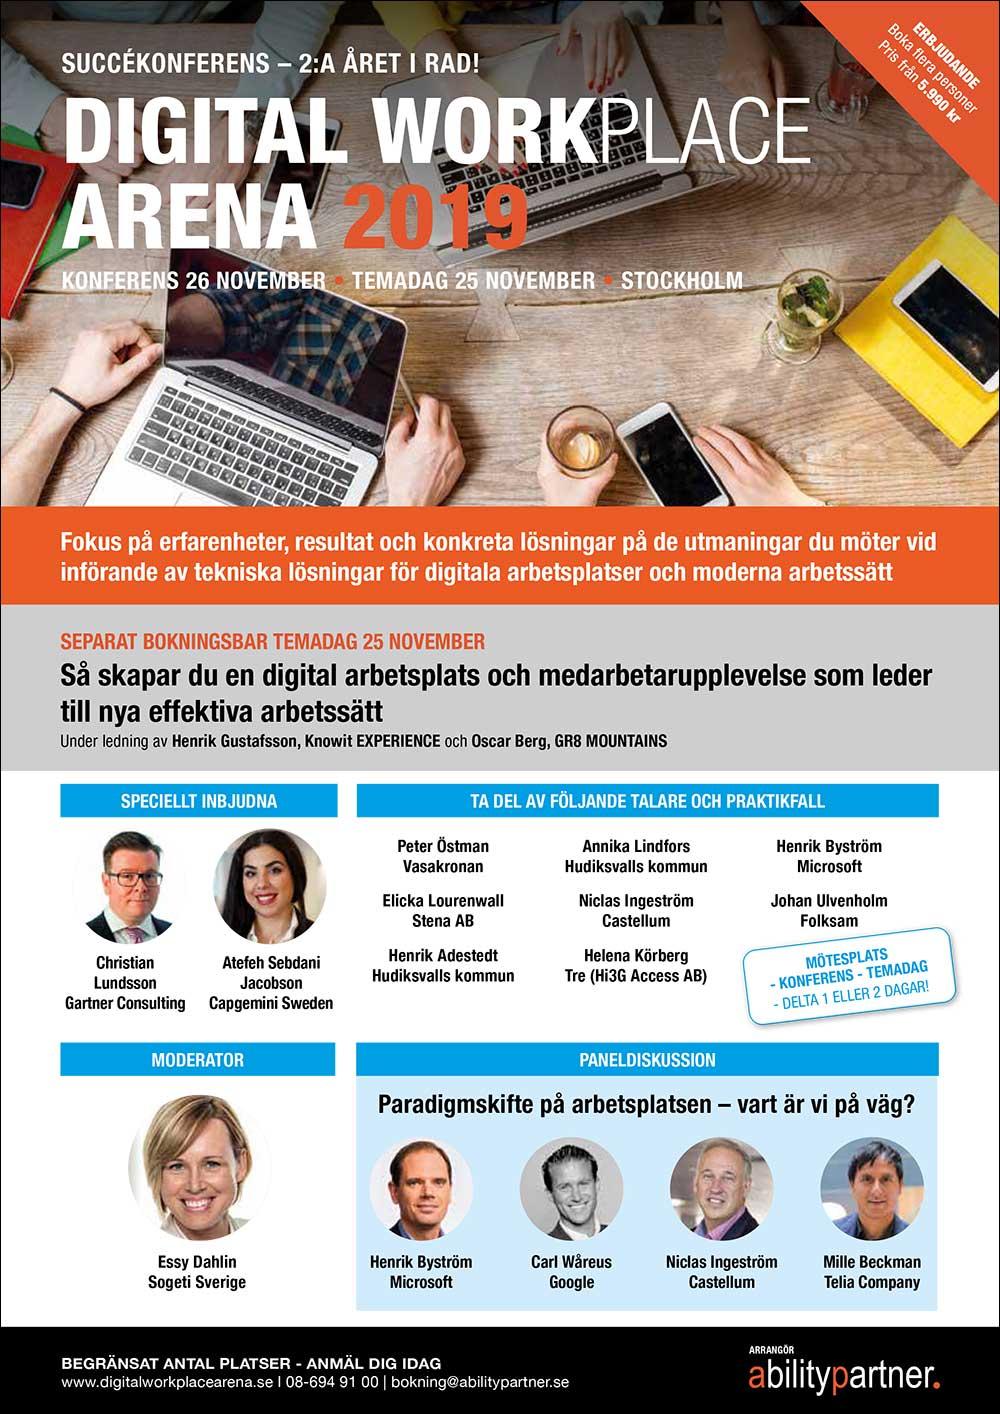 DIGITAL-WORKPLACE-ARENA-2019